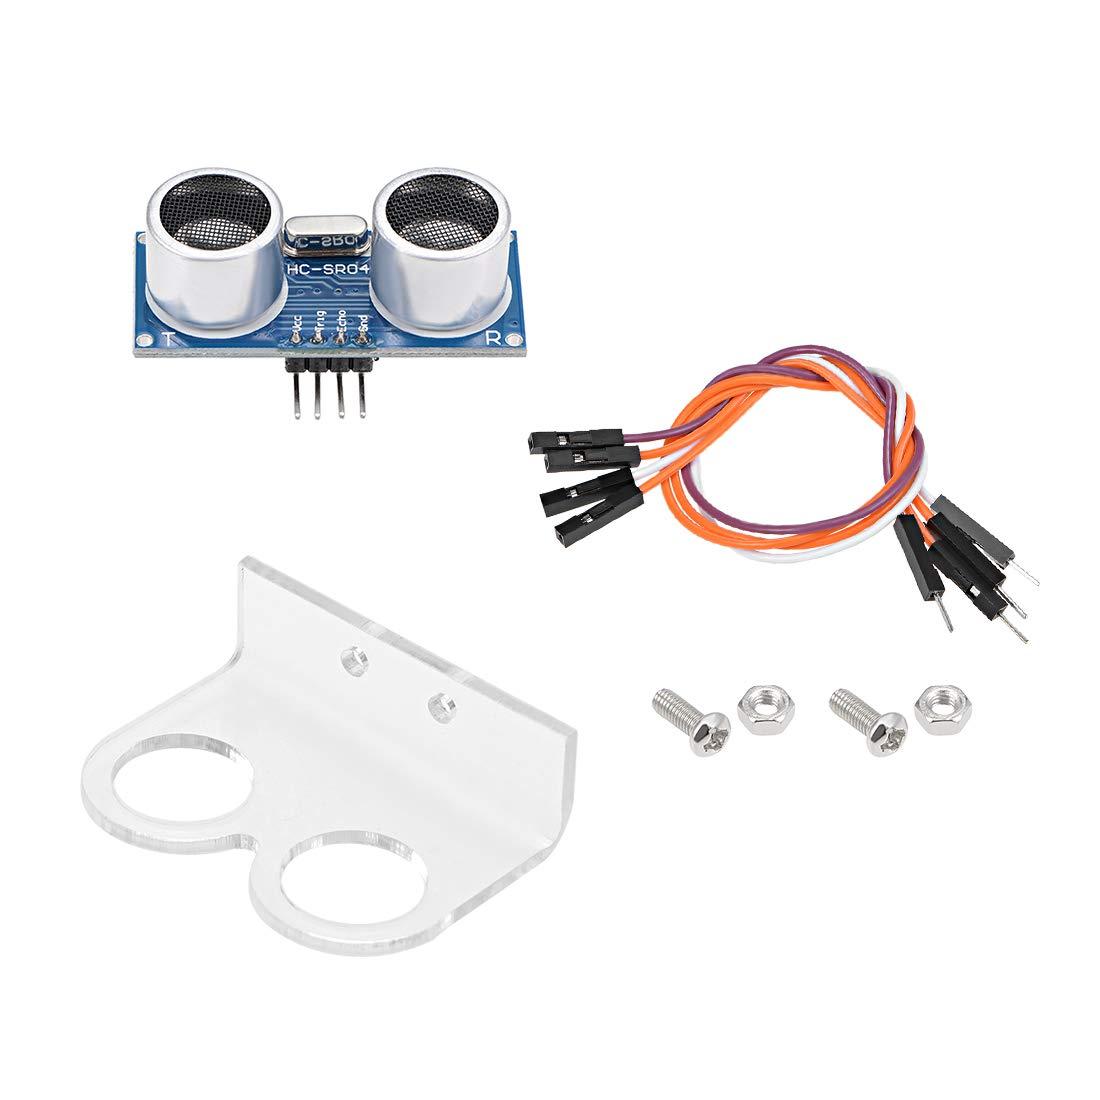 uxcell Ultrasonic Module HC-SR04 Distance Sensor with Bracket and Jumper Wire for Arduino UNO MEGA R3 Mega2560 Duemilanove Nano Robot